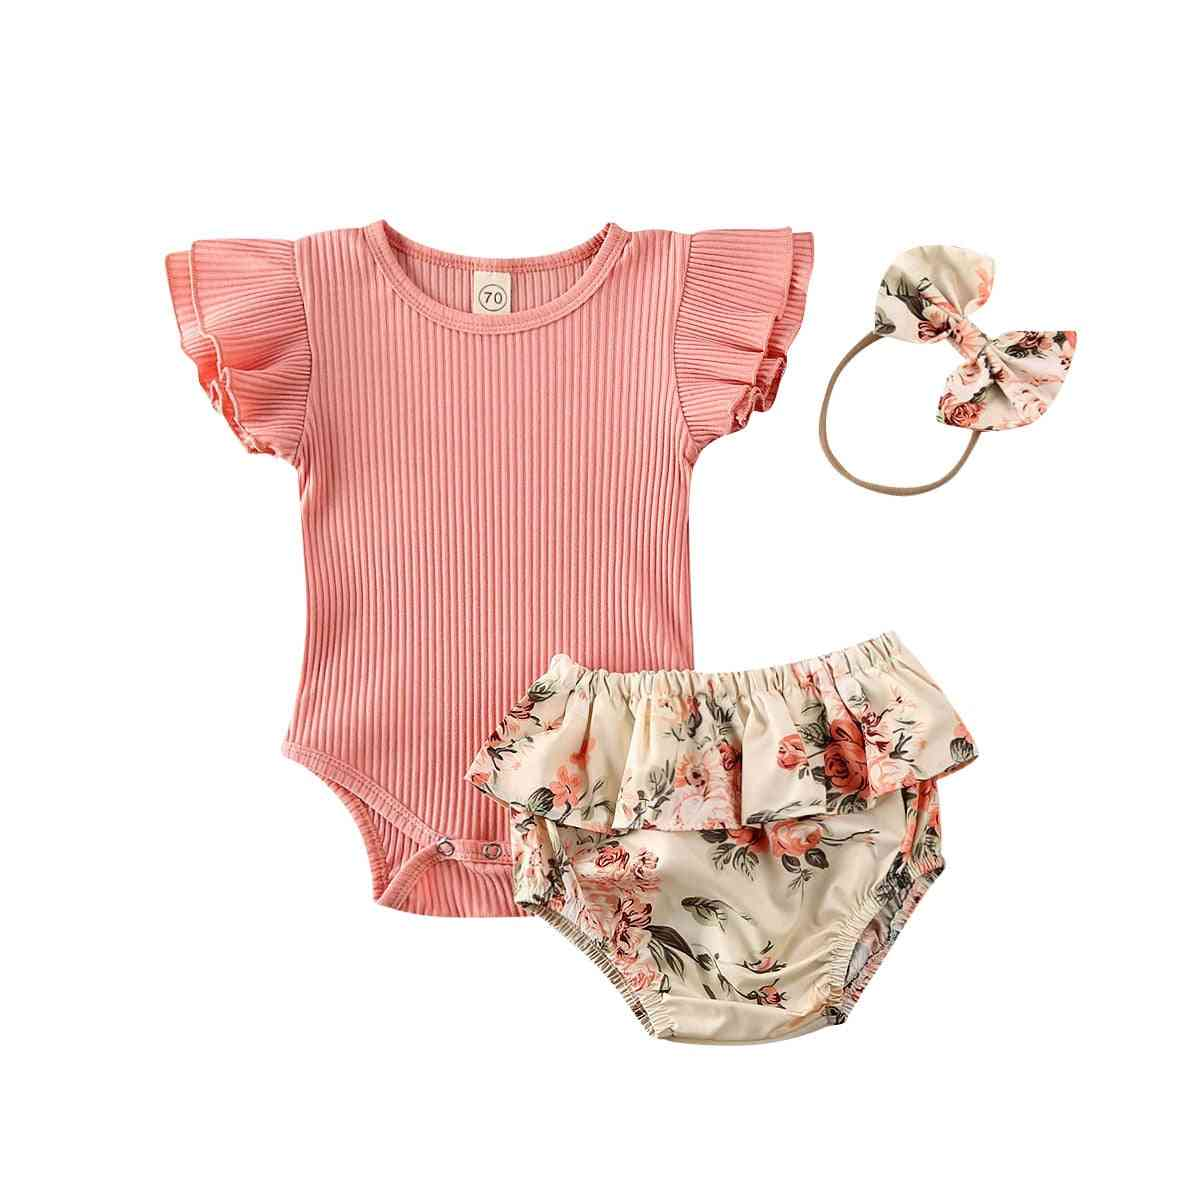 Baby Summer Clothing, Newborn Baby Girl Ruffled Ribbed Bodysuit Floral Shorts Headband